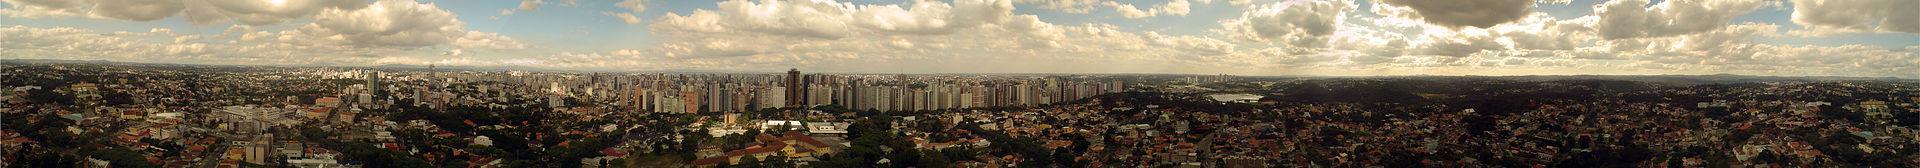 Curitiba vai receber torneio de Jiu-Jitsu da CBJJ. Foto: Squibb